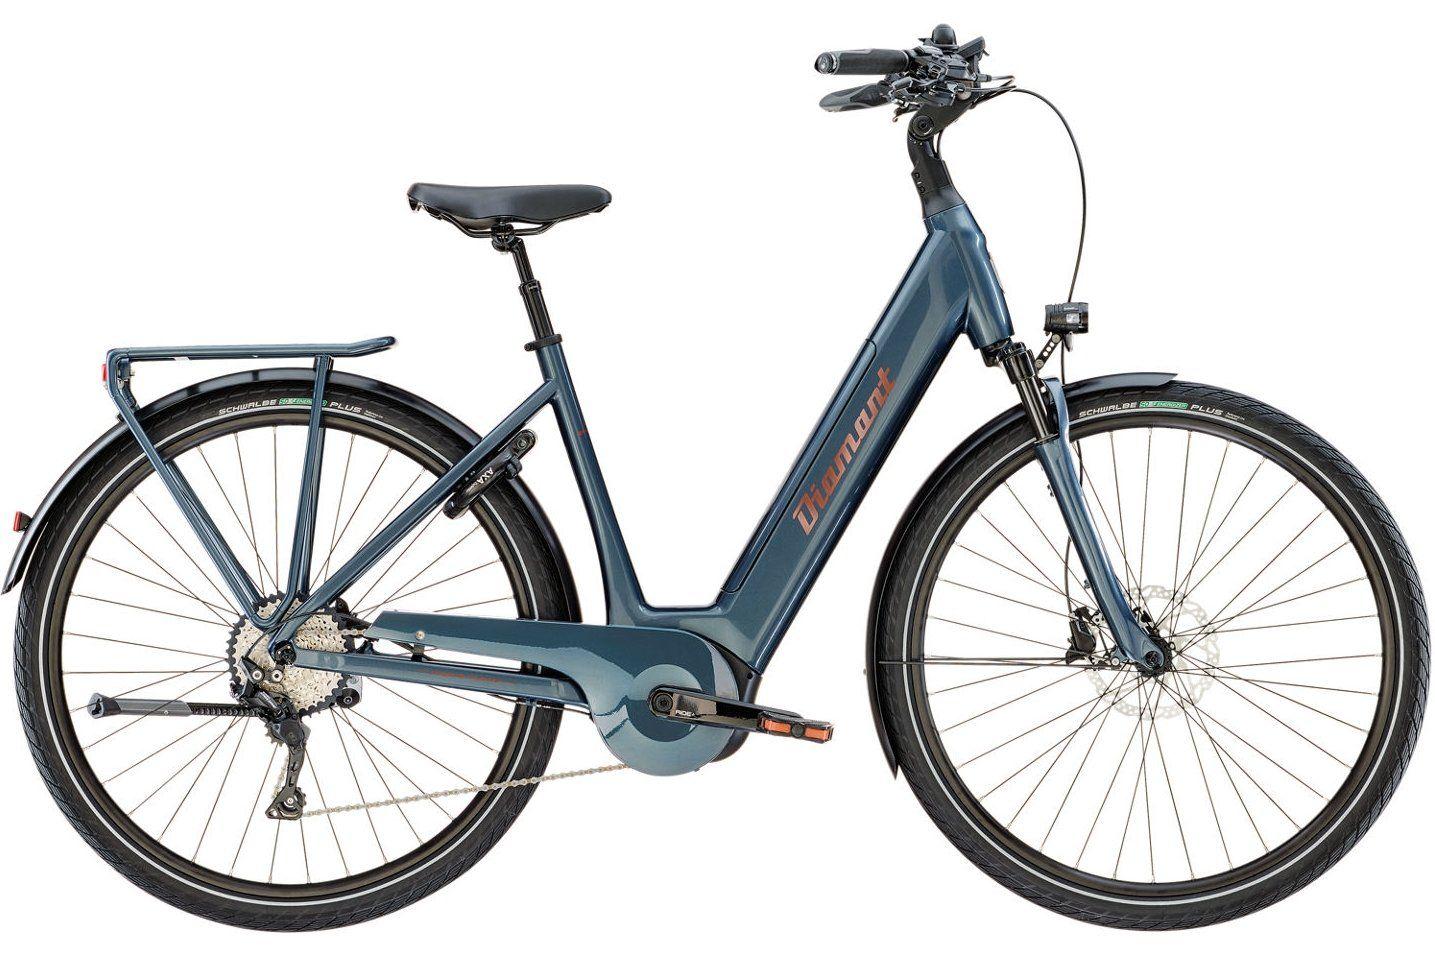 2018 Diamant ZAGORA+ DAMEN Cavansitblau jehlebikes Fahrrad